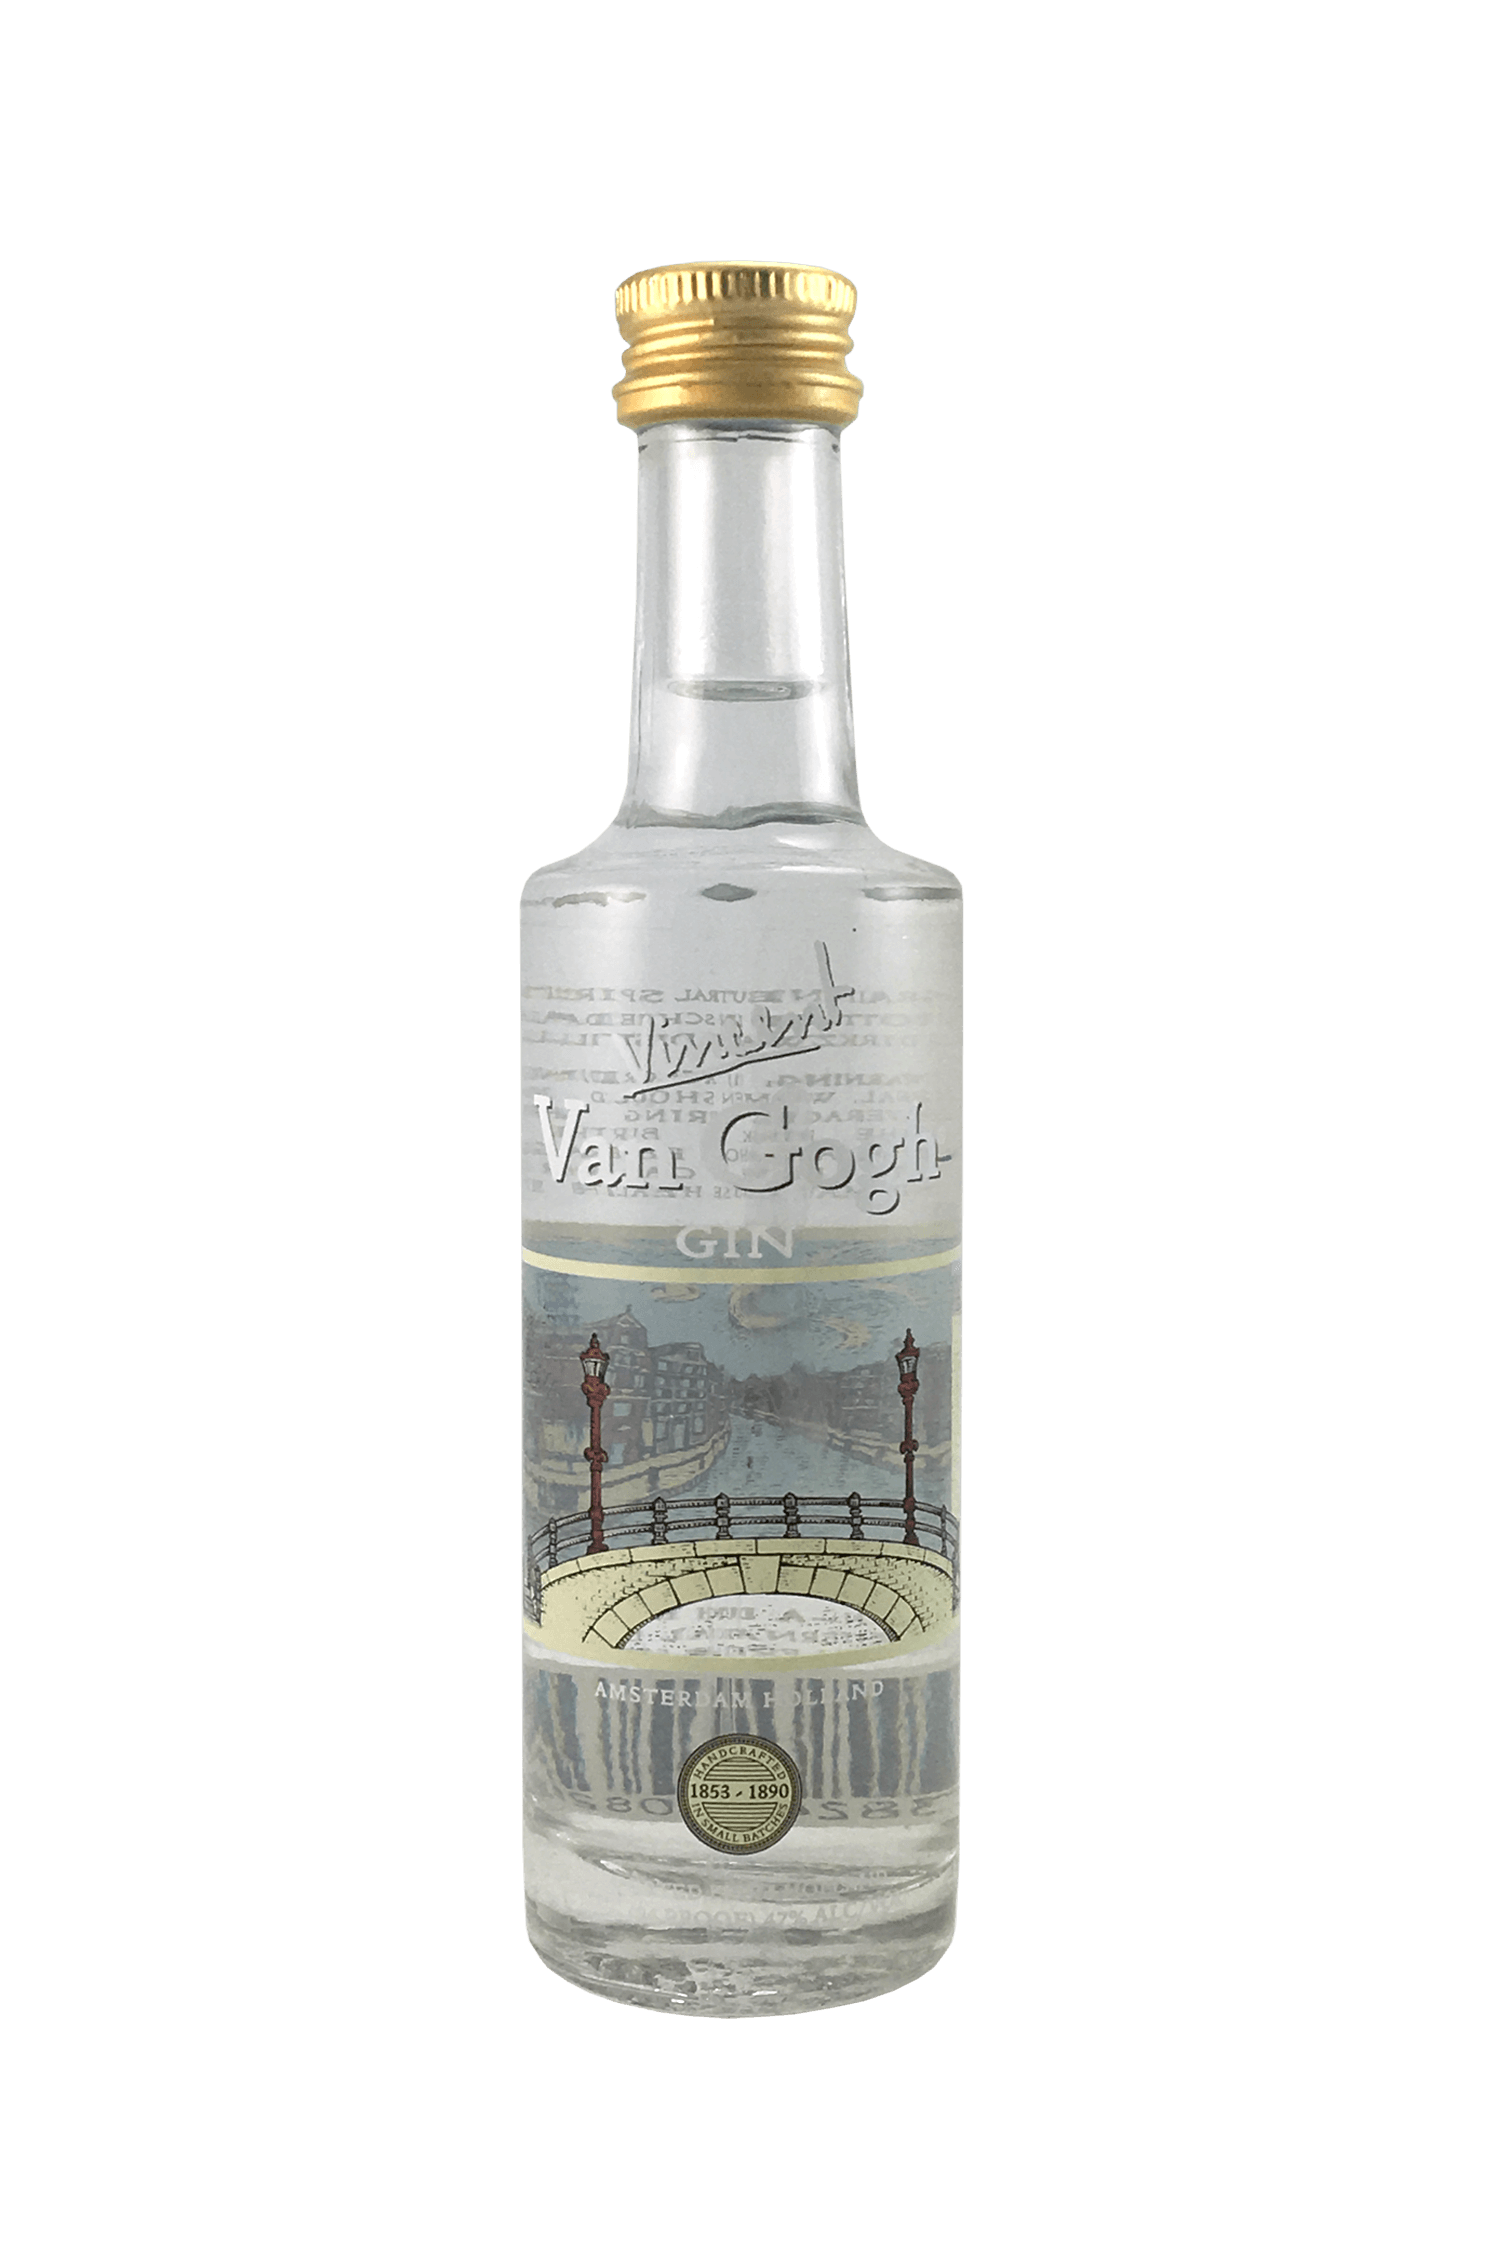 Van gogh – Gin